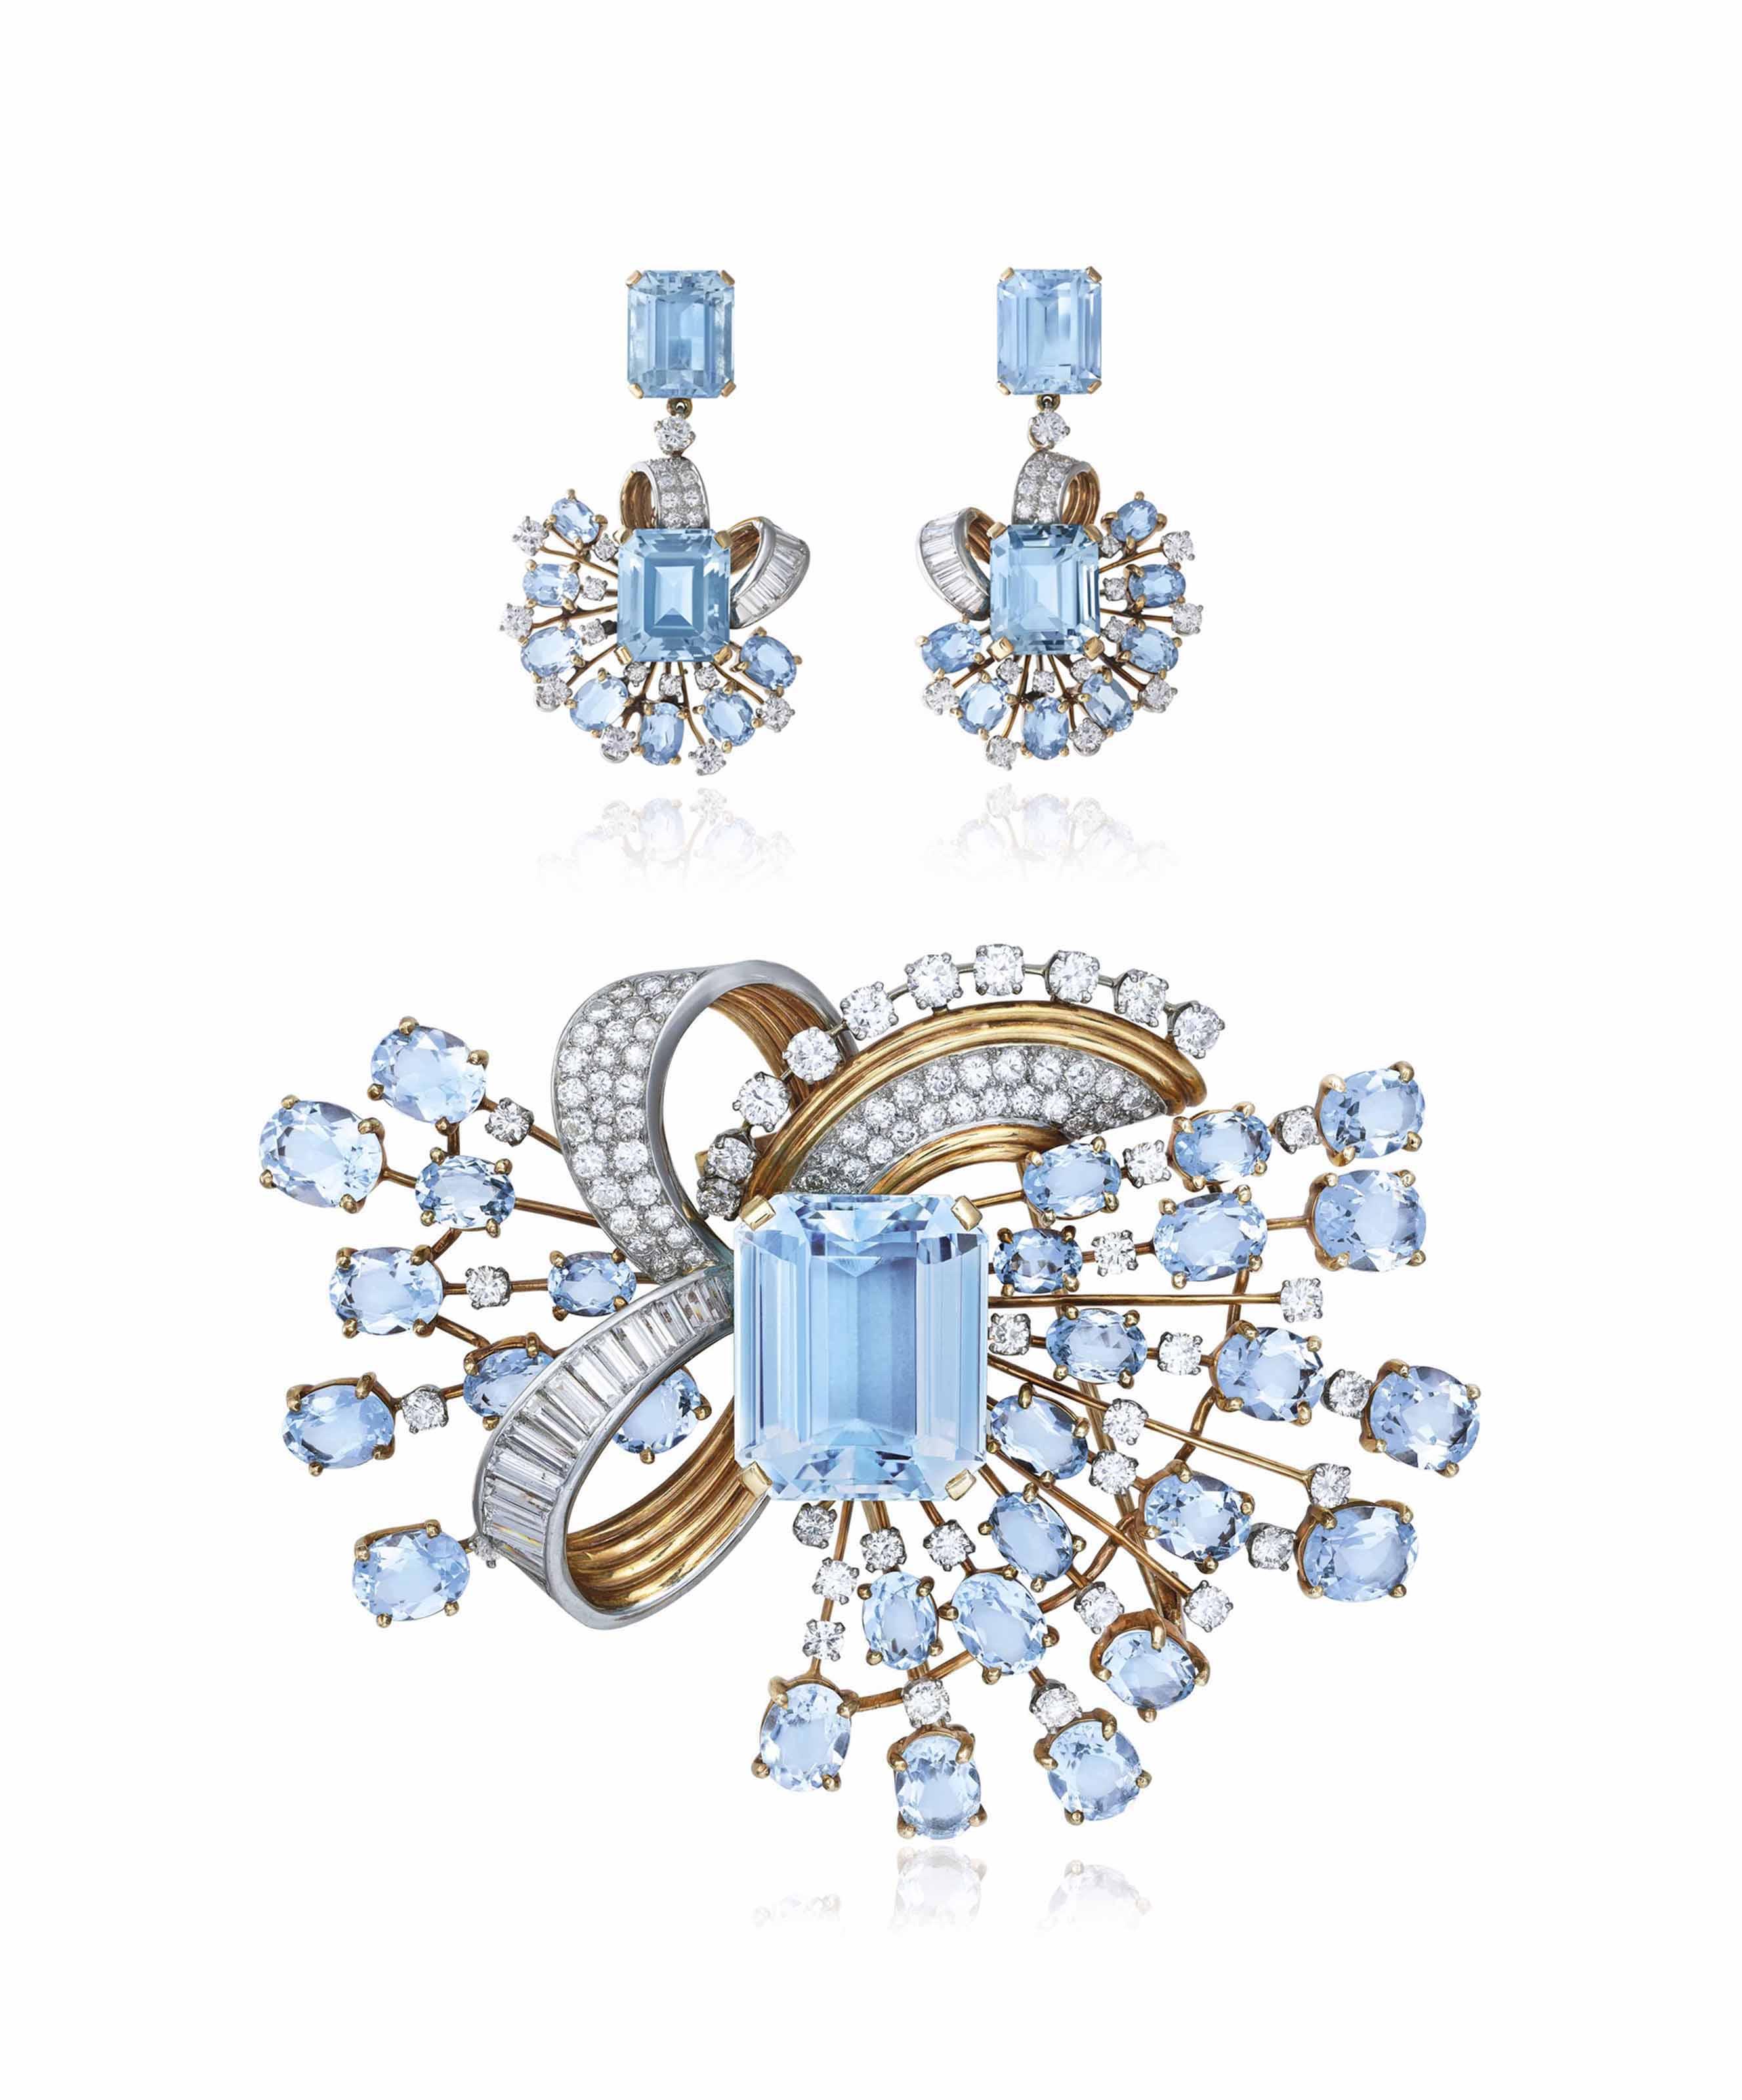 RETRO AQUAMARINE AND DIAMOND BROOCH AND EARRINGS, TRABERT & HOEFFER - MAUBOUSSIN